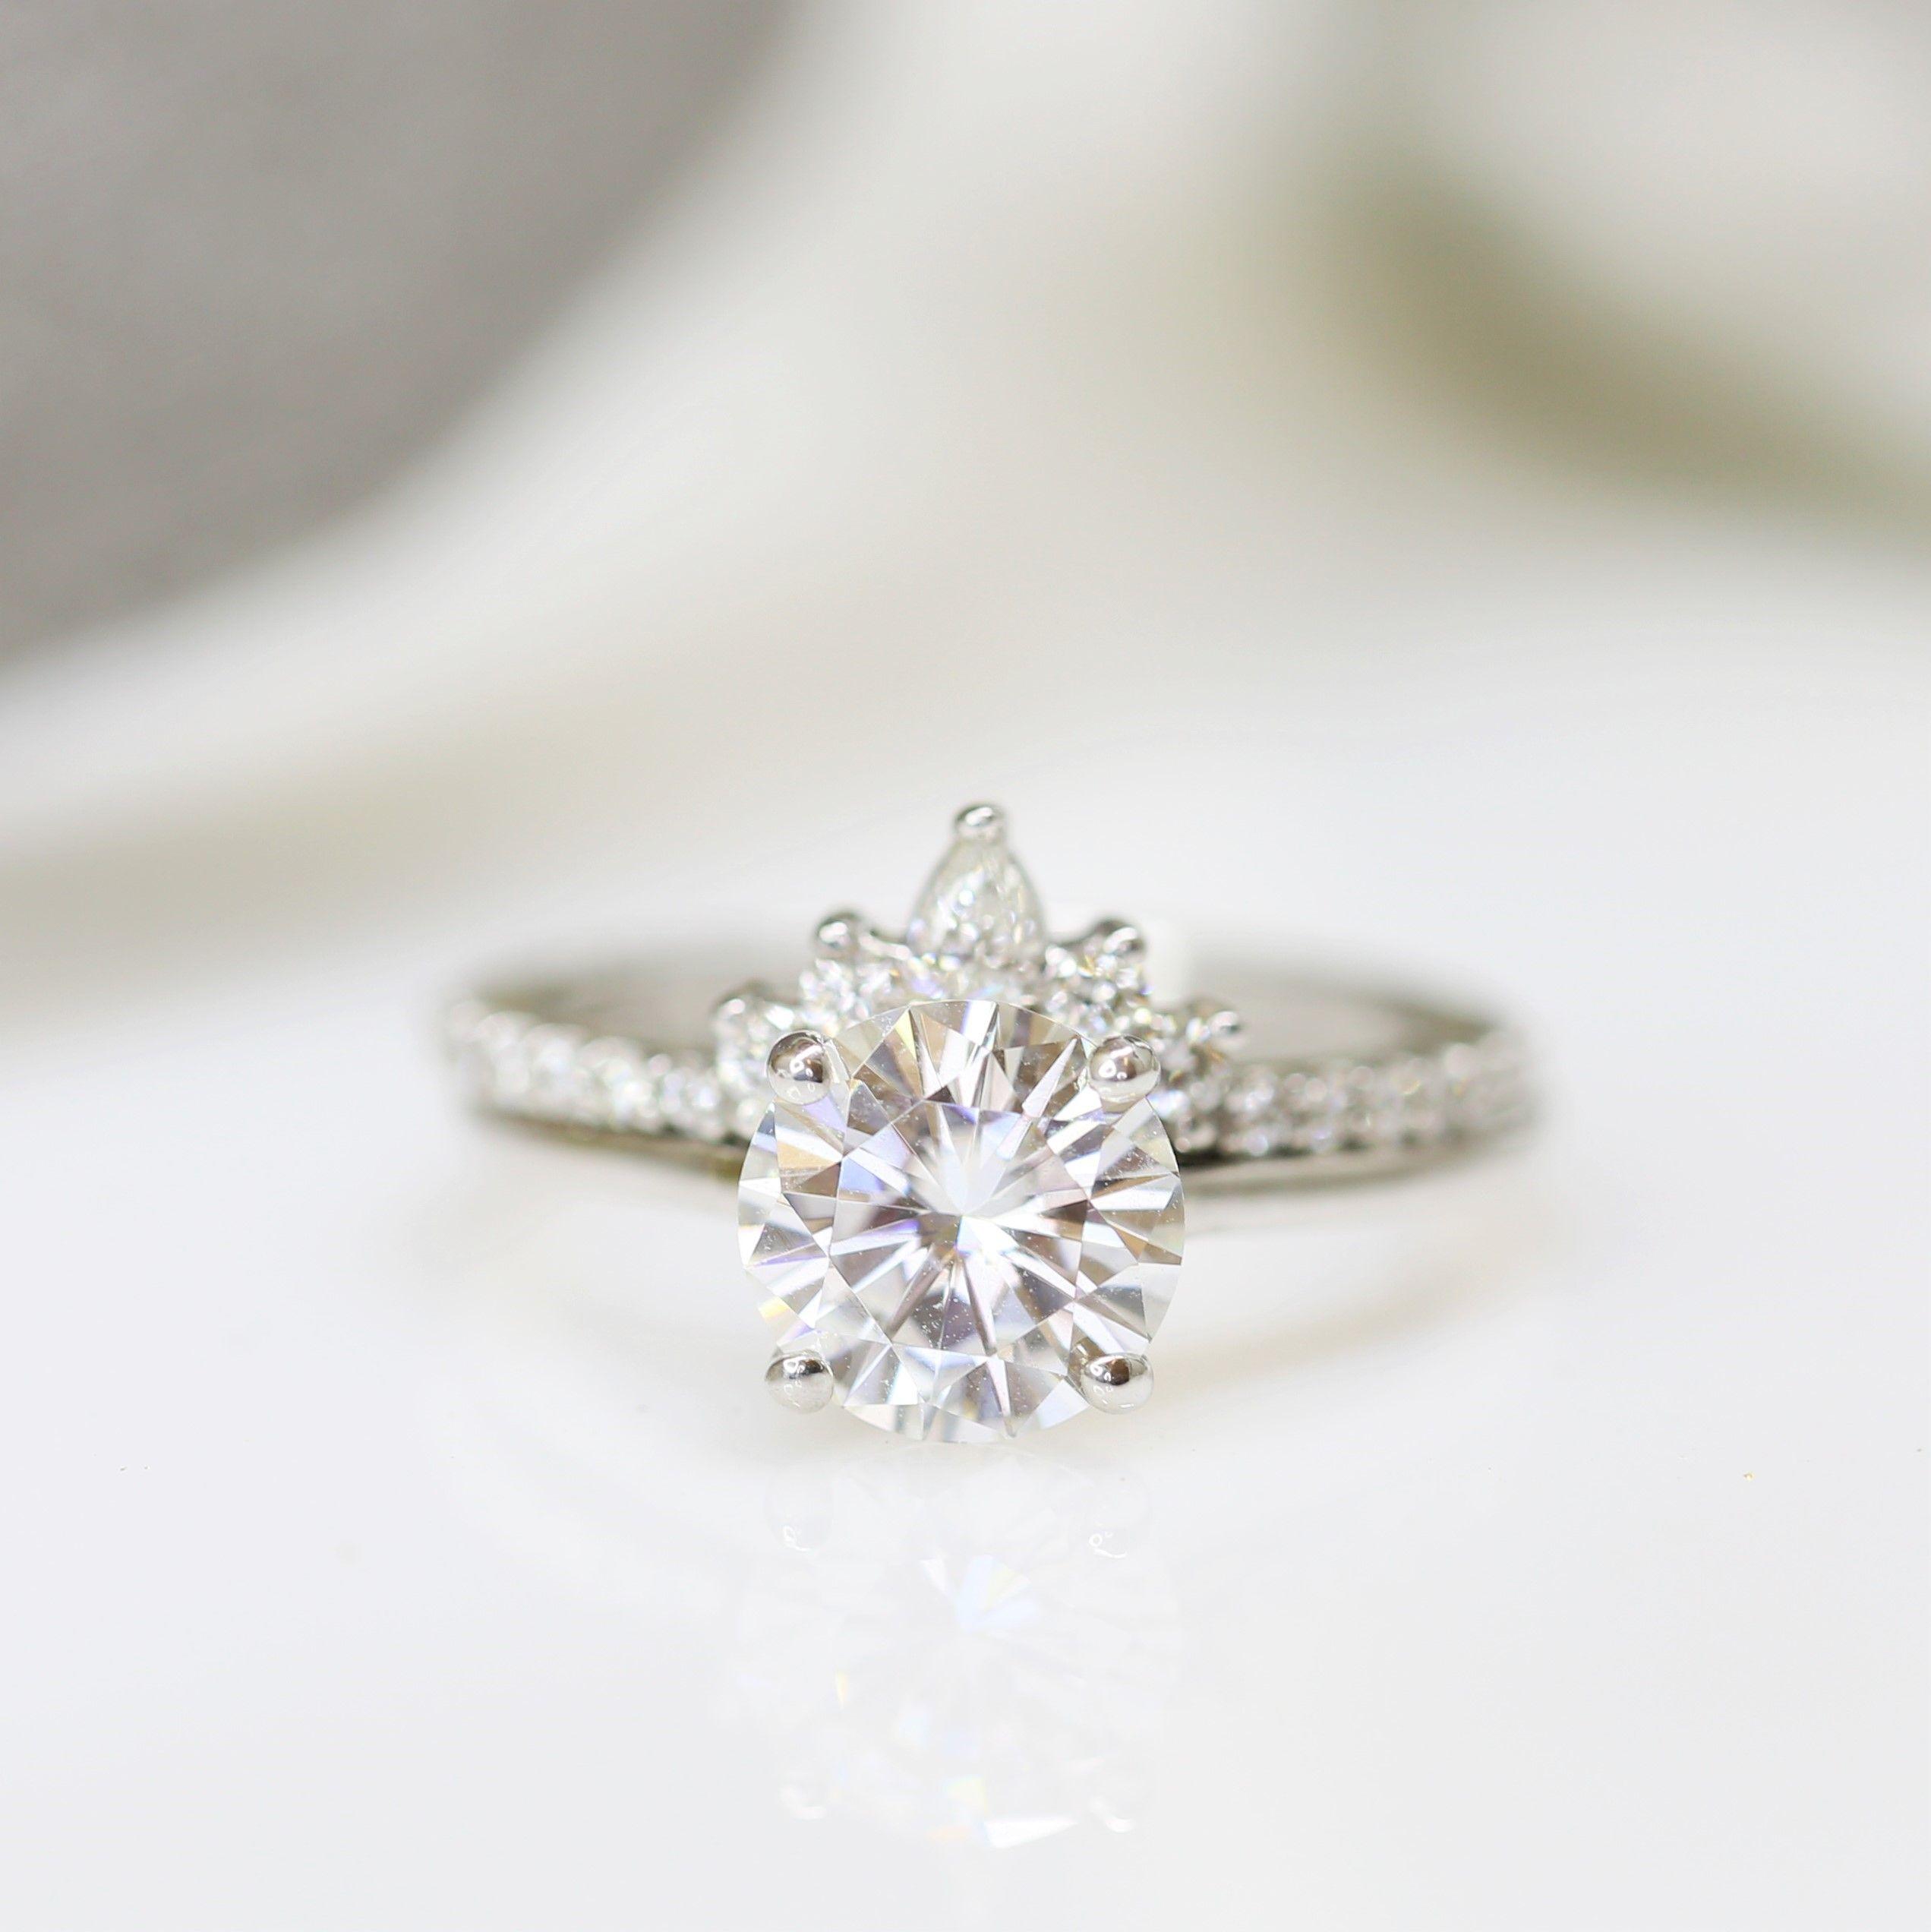 Wedding Gifts Chicago: Rosados Box Dixie 8mm & Riri 14kt White Gold Round F1